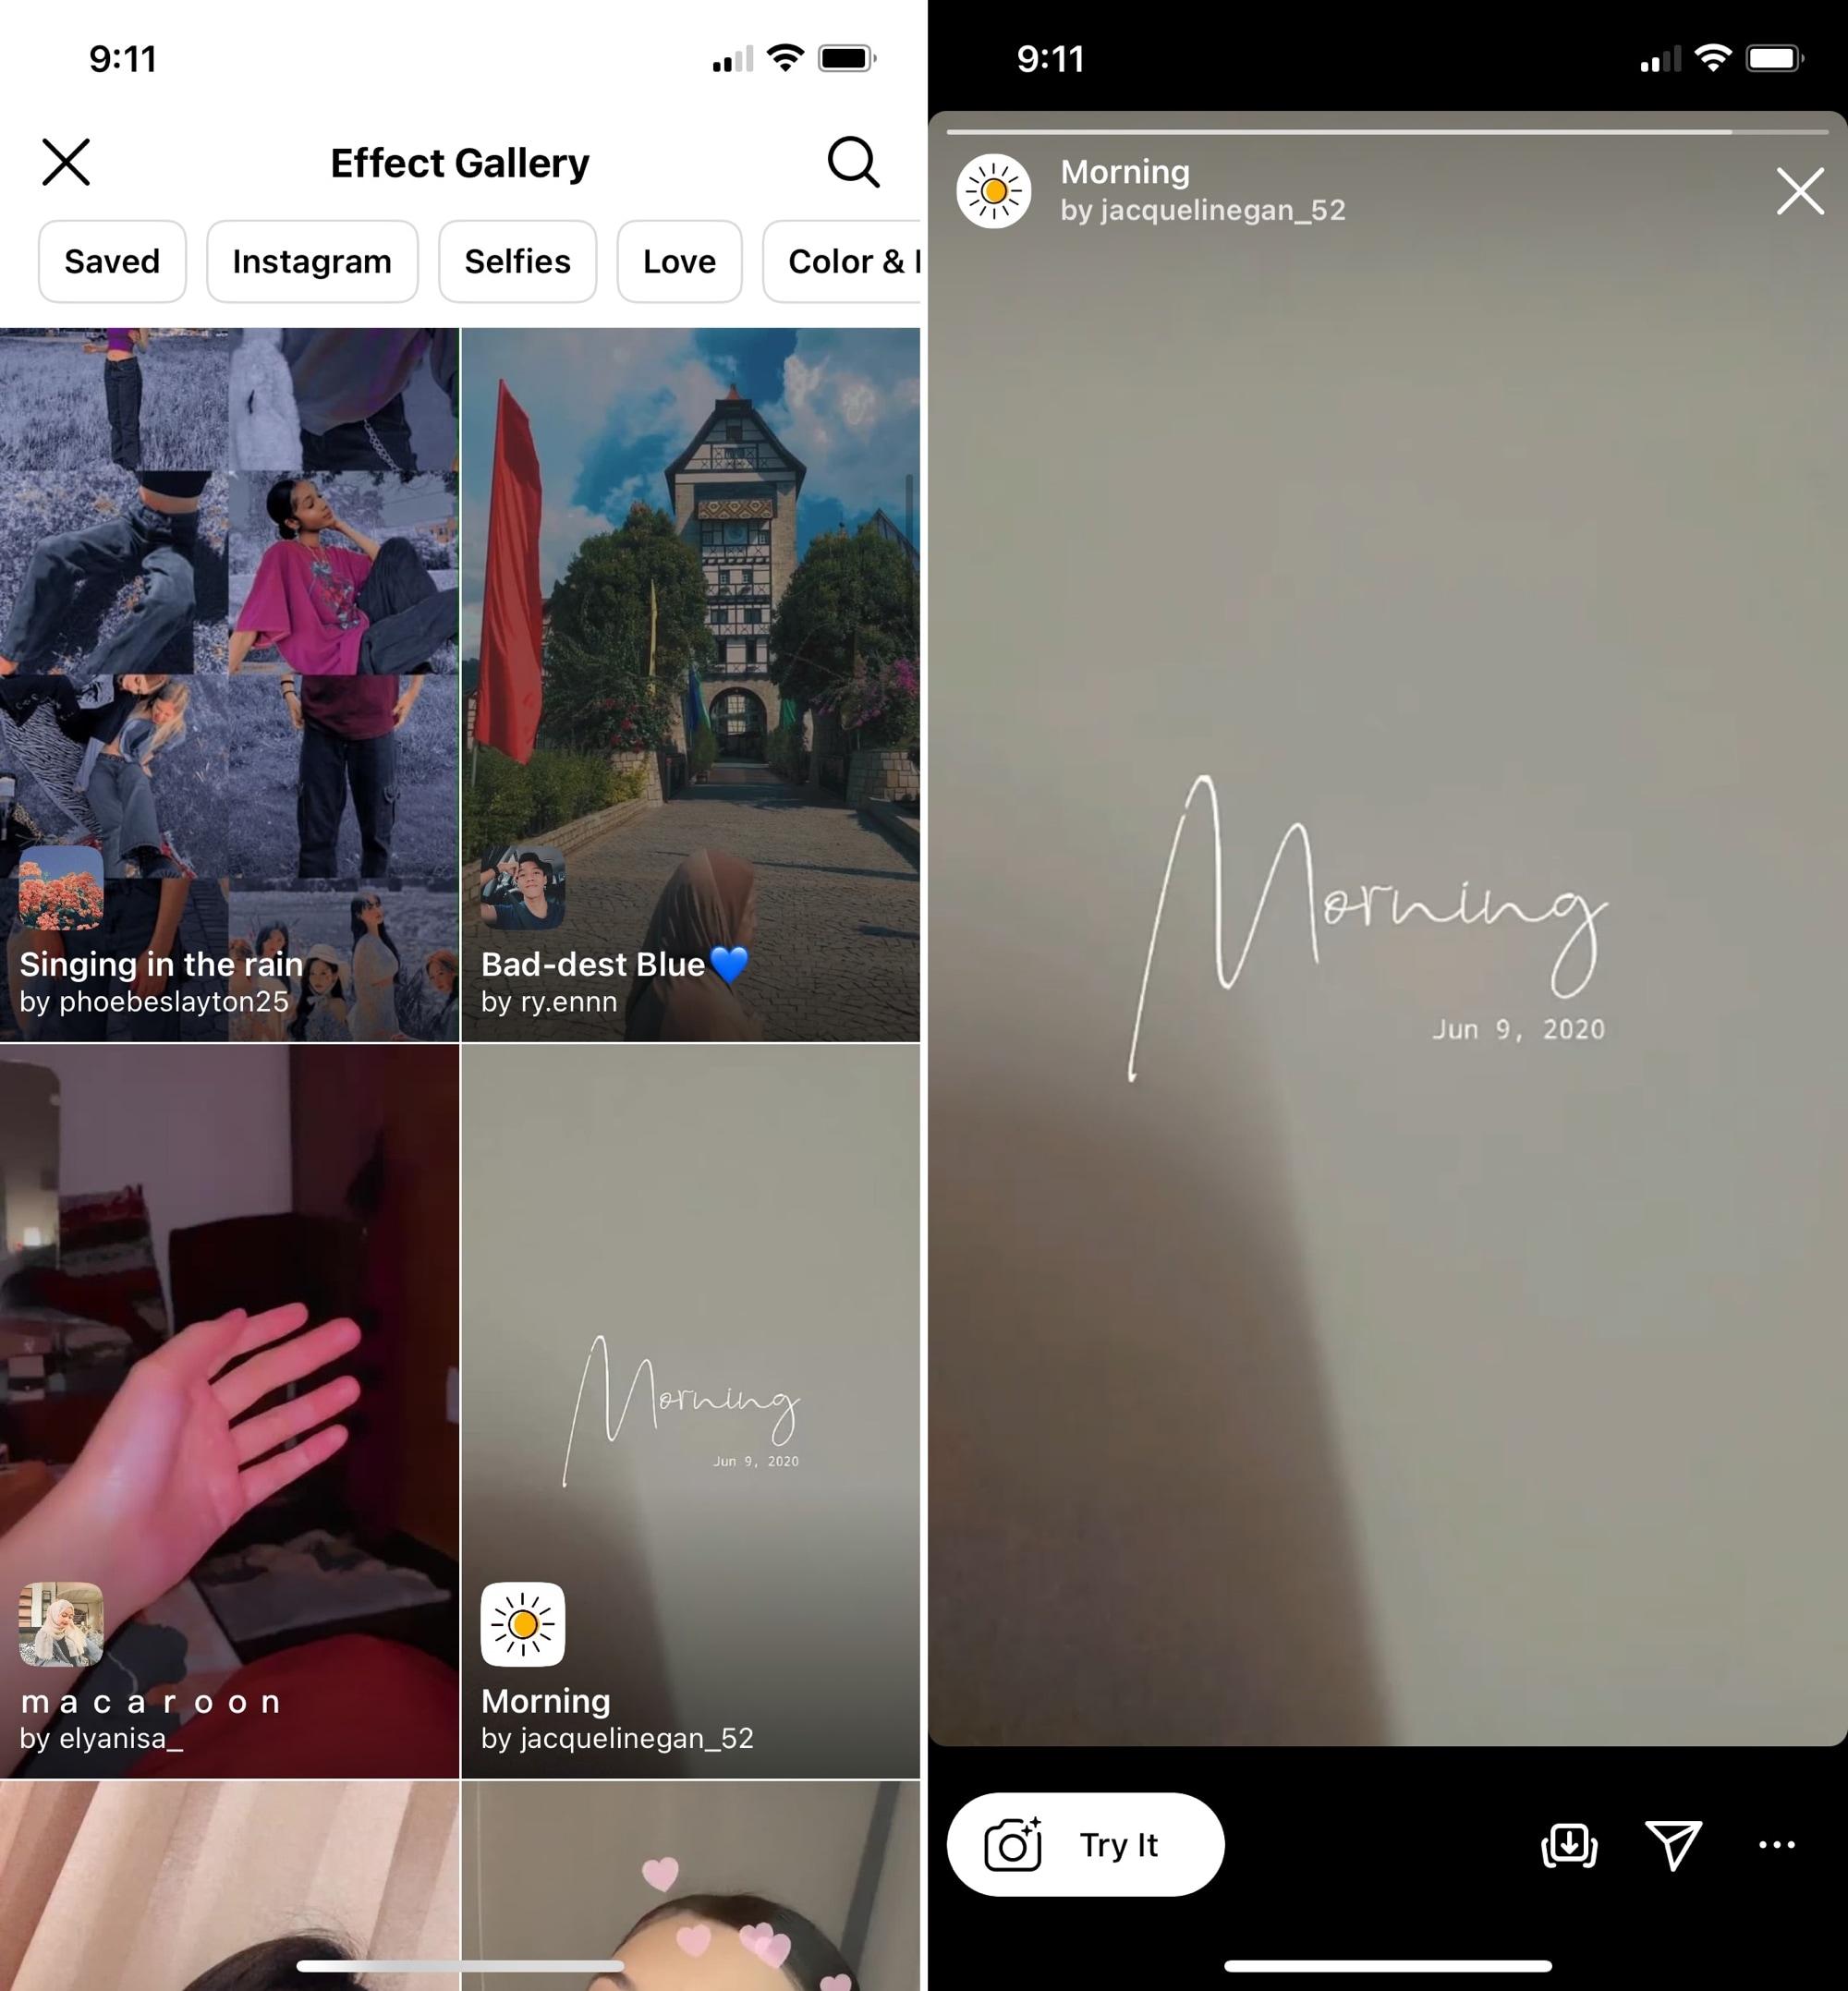 Instagram Effect Gallery